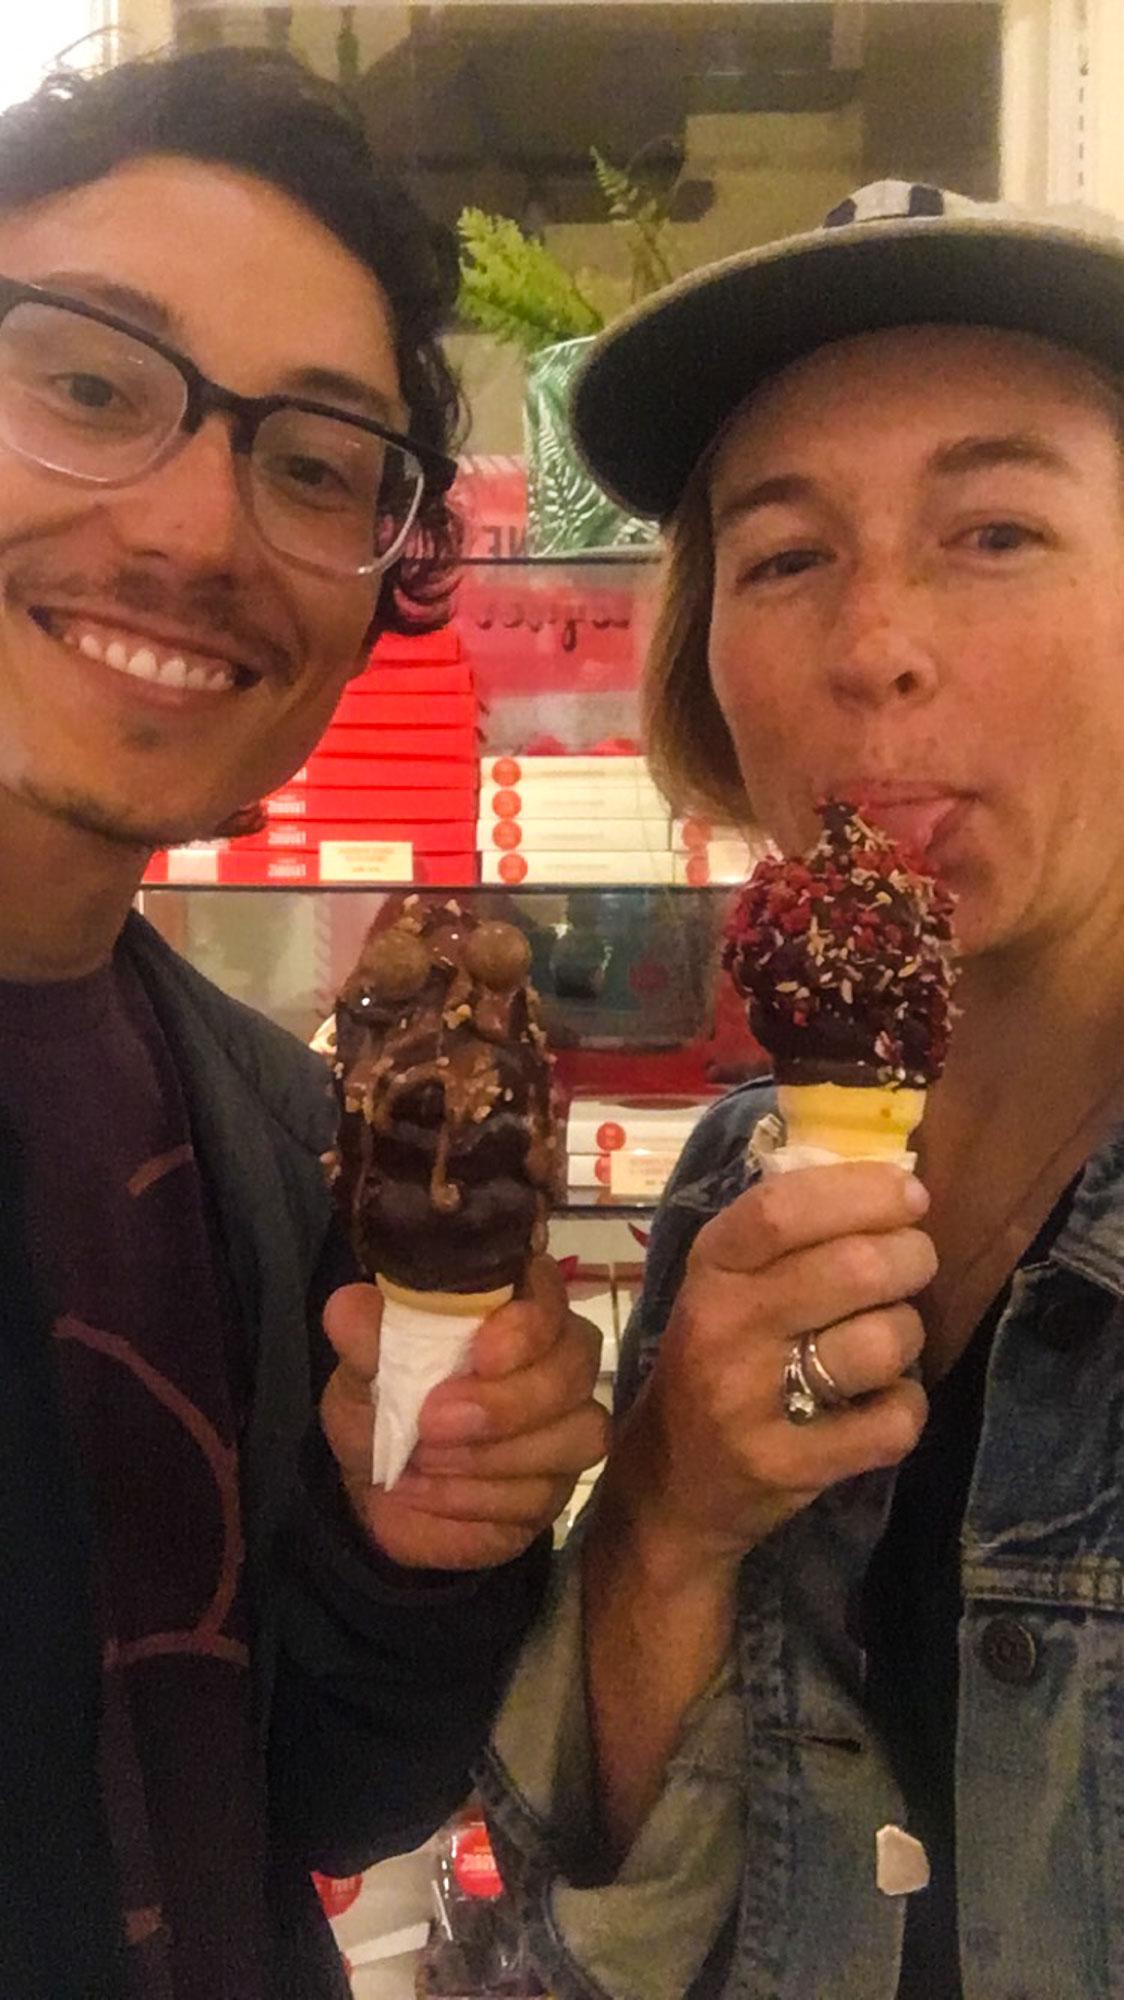 Enjoying the amazingly fancy dip cones at Chocolats Favoris